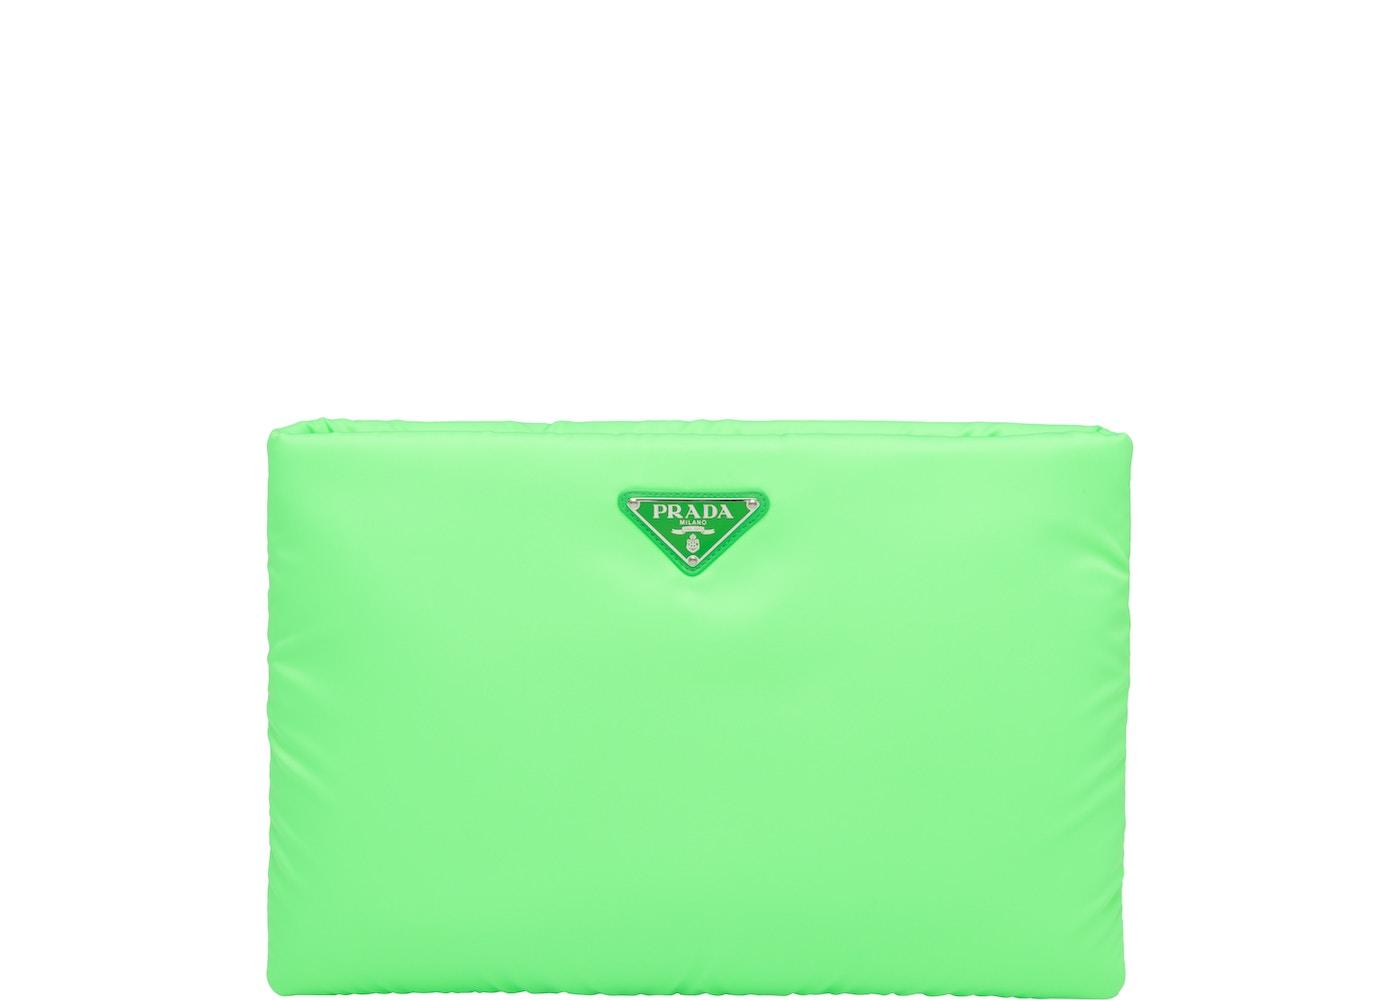 debc07c9259e Prada Clutch Padded Nylon Large Green. Large Green